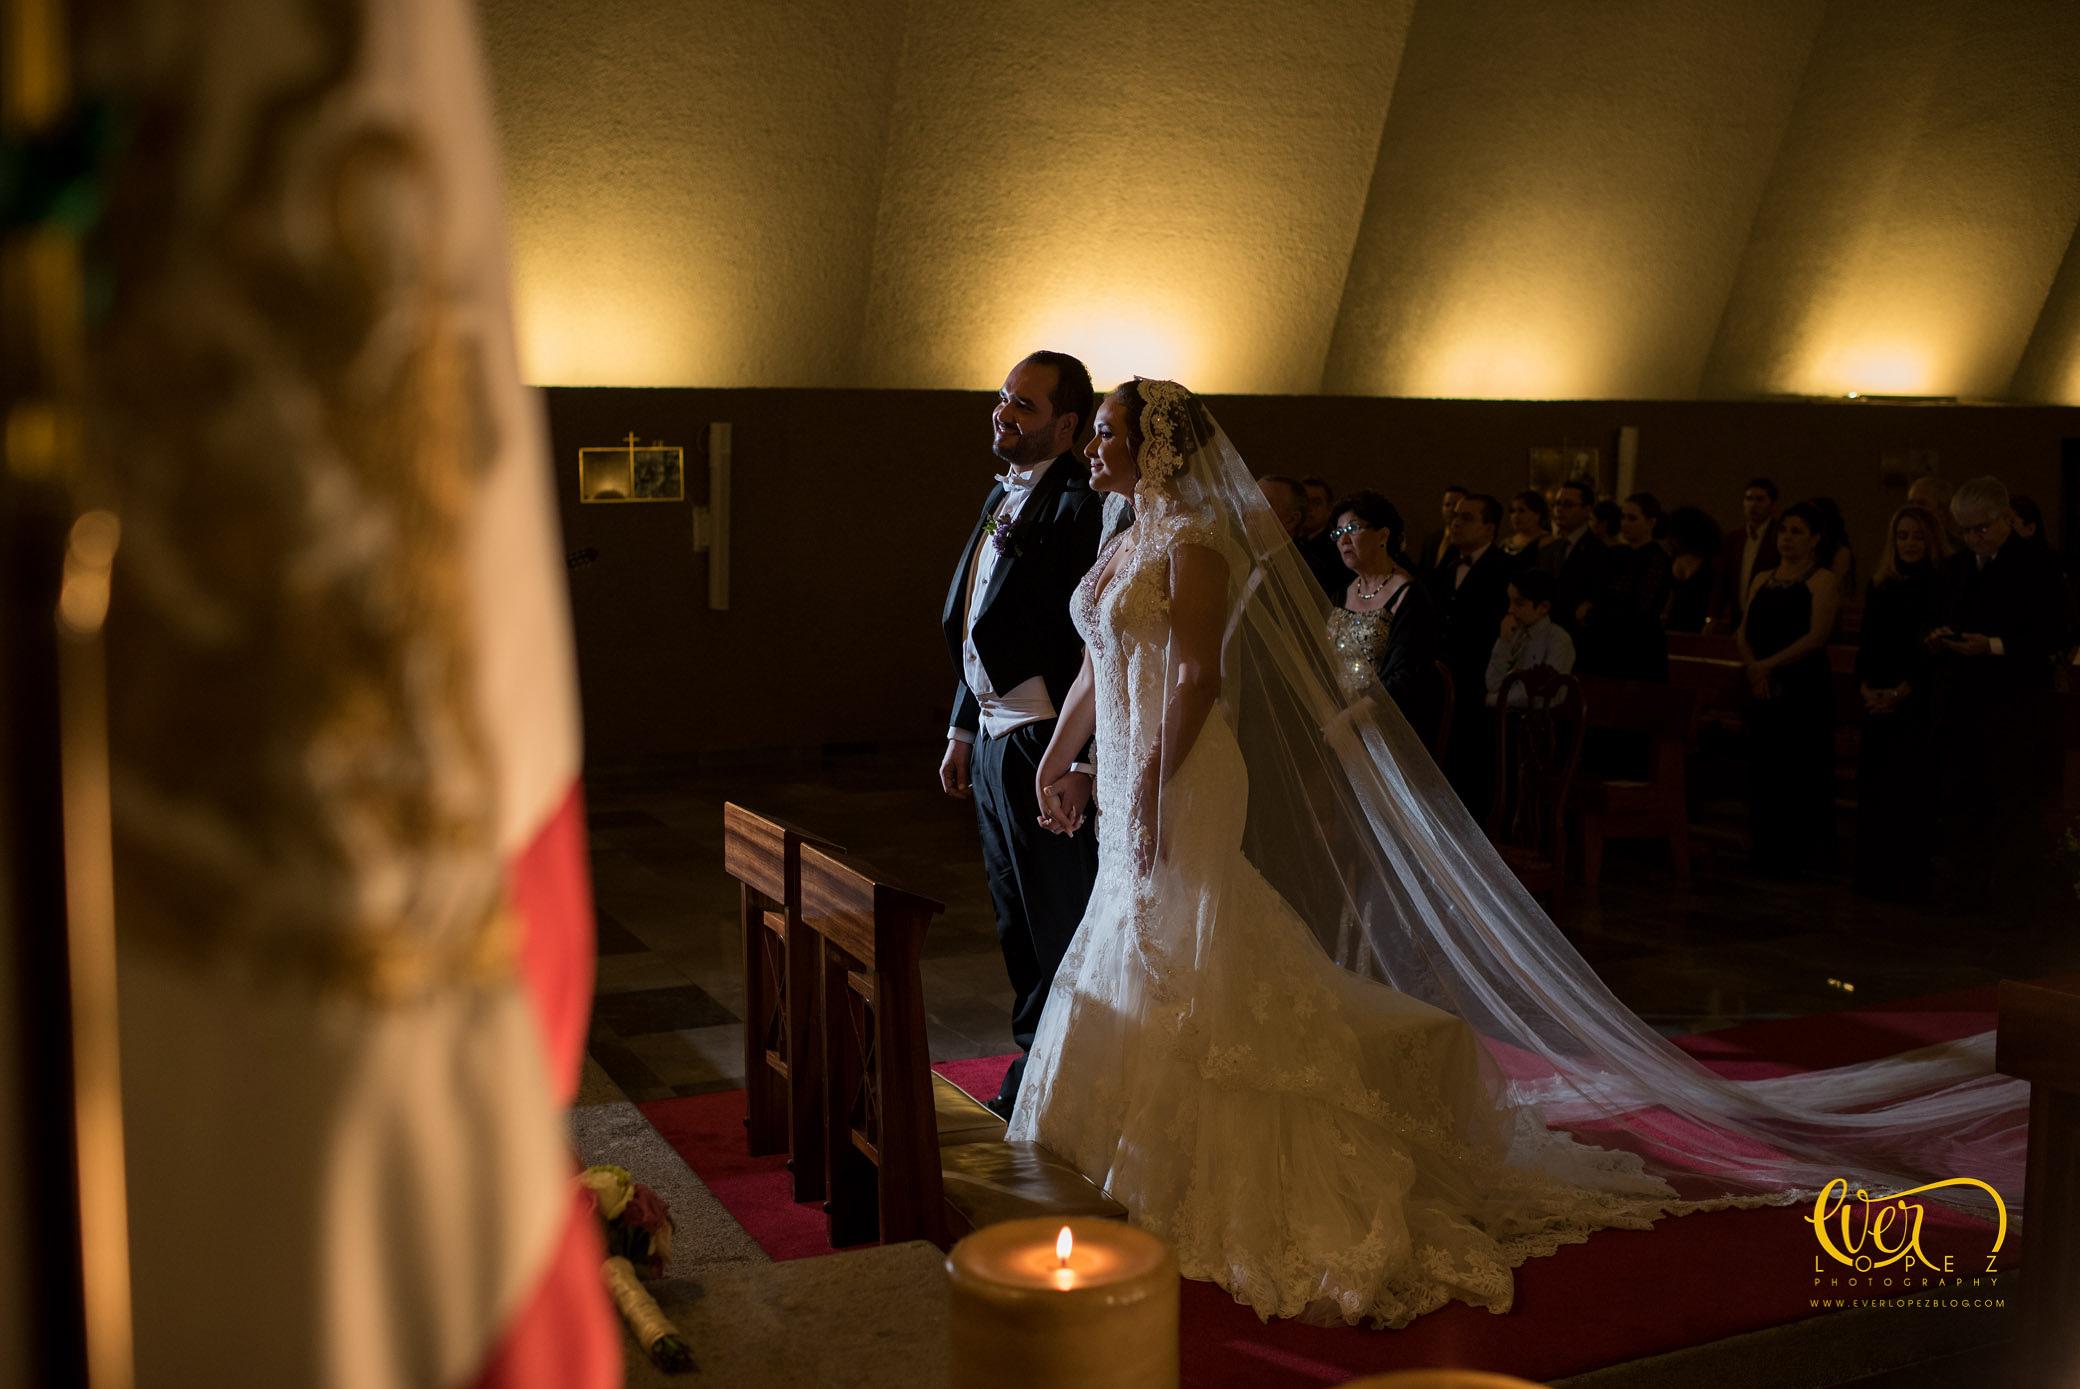 Fotografo para bodas en Guadalajara